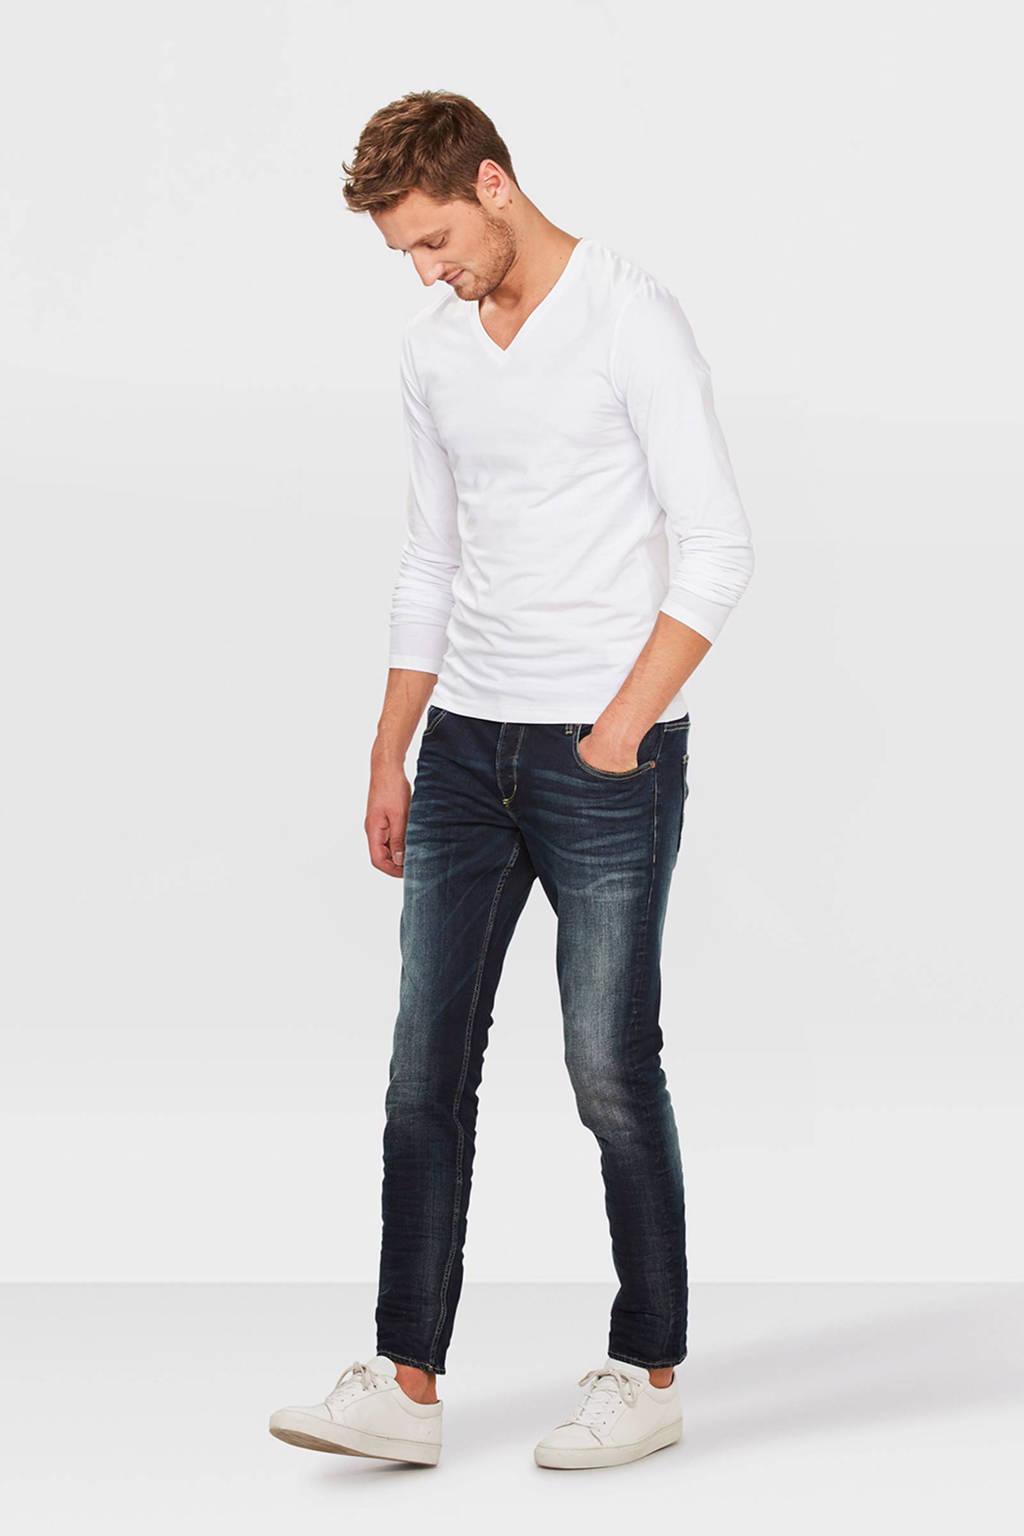 WE Fashion Fundamental T-shirt, White Uni